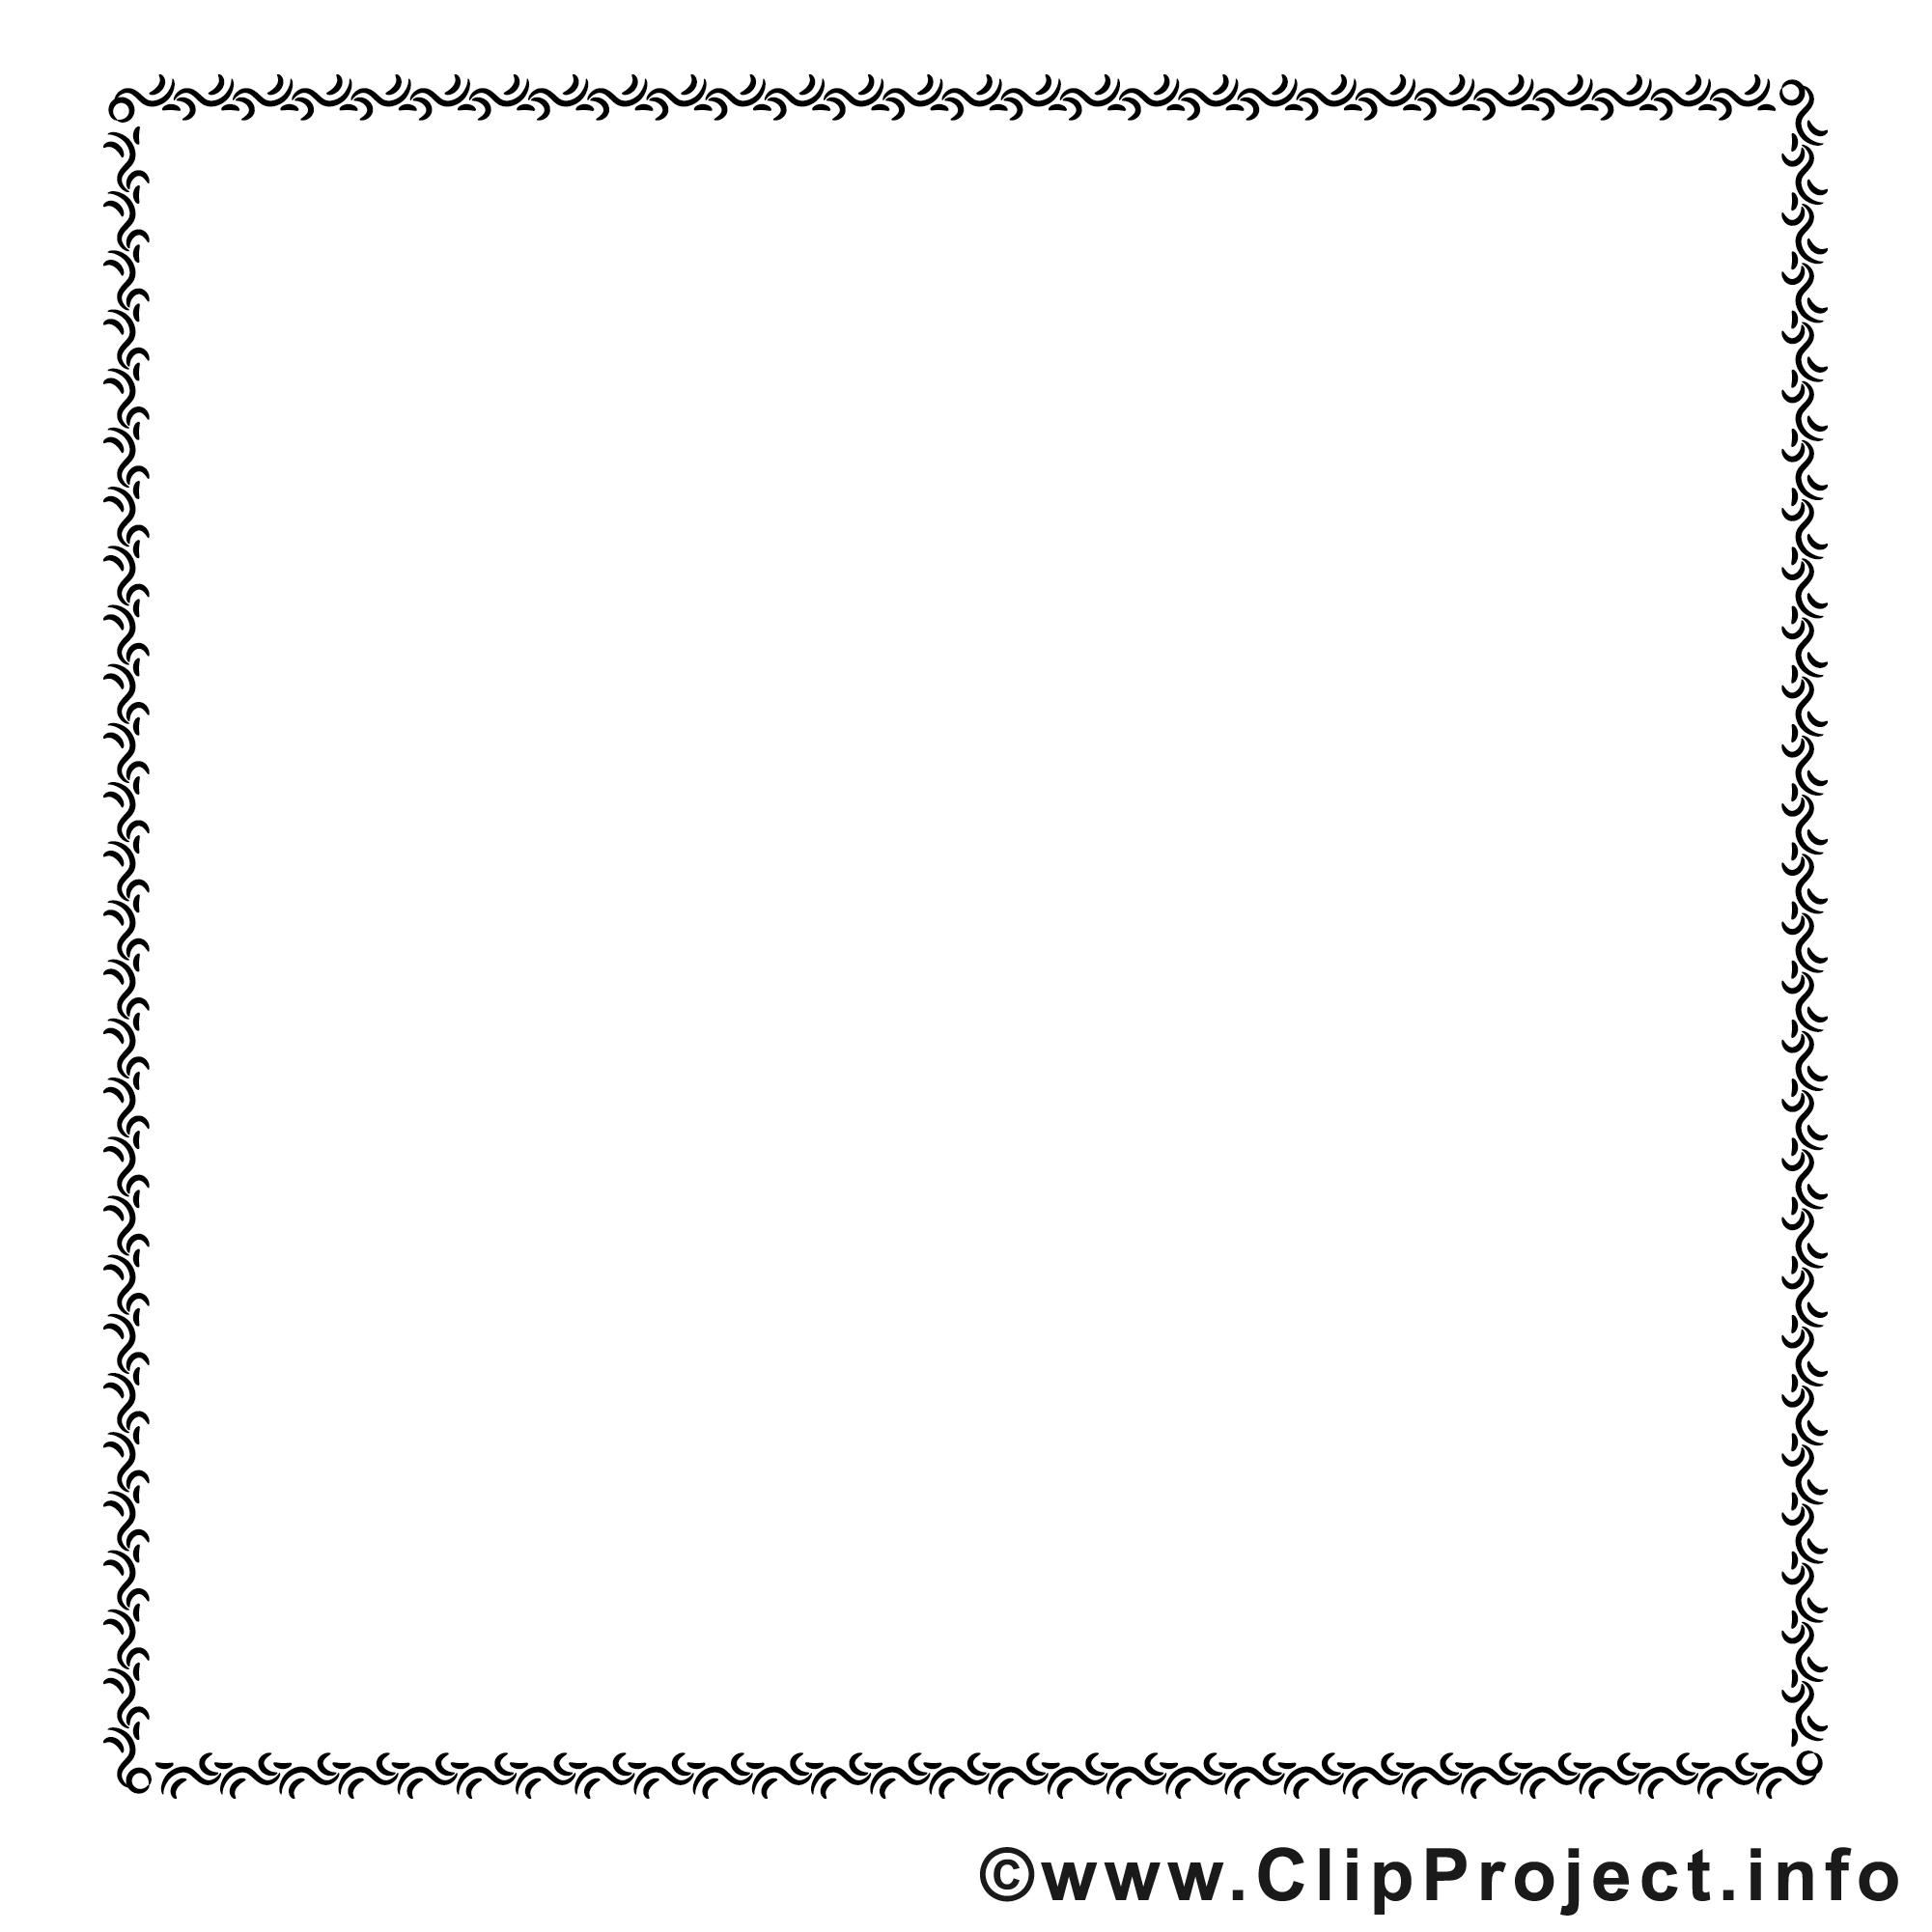 Bordure image gratuite – Cadre clipart